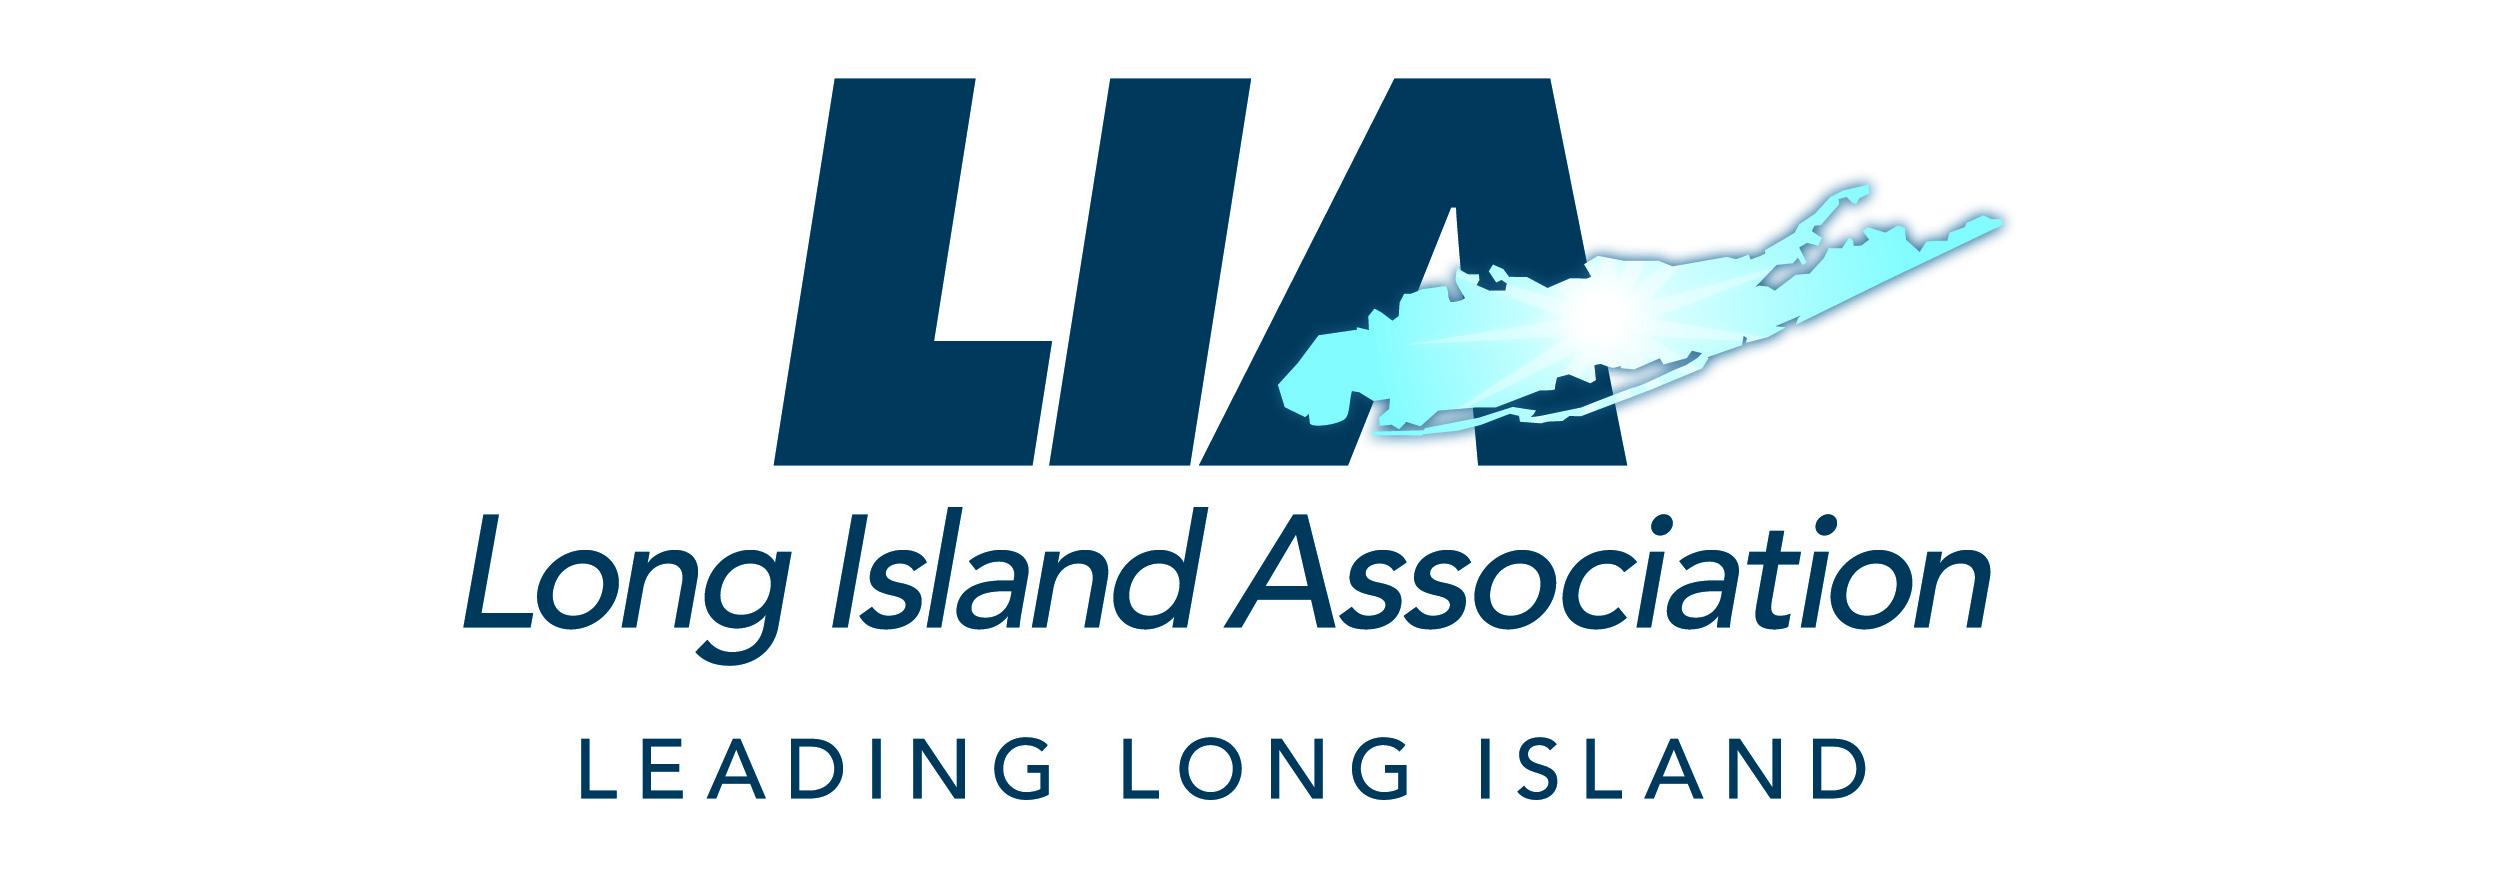 LIA Box.jpg